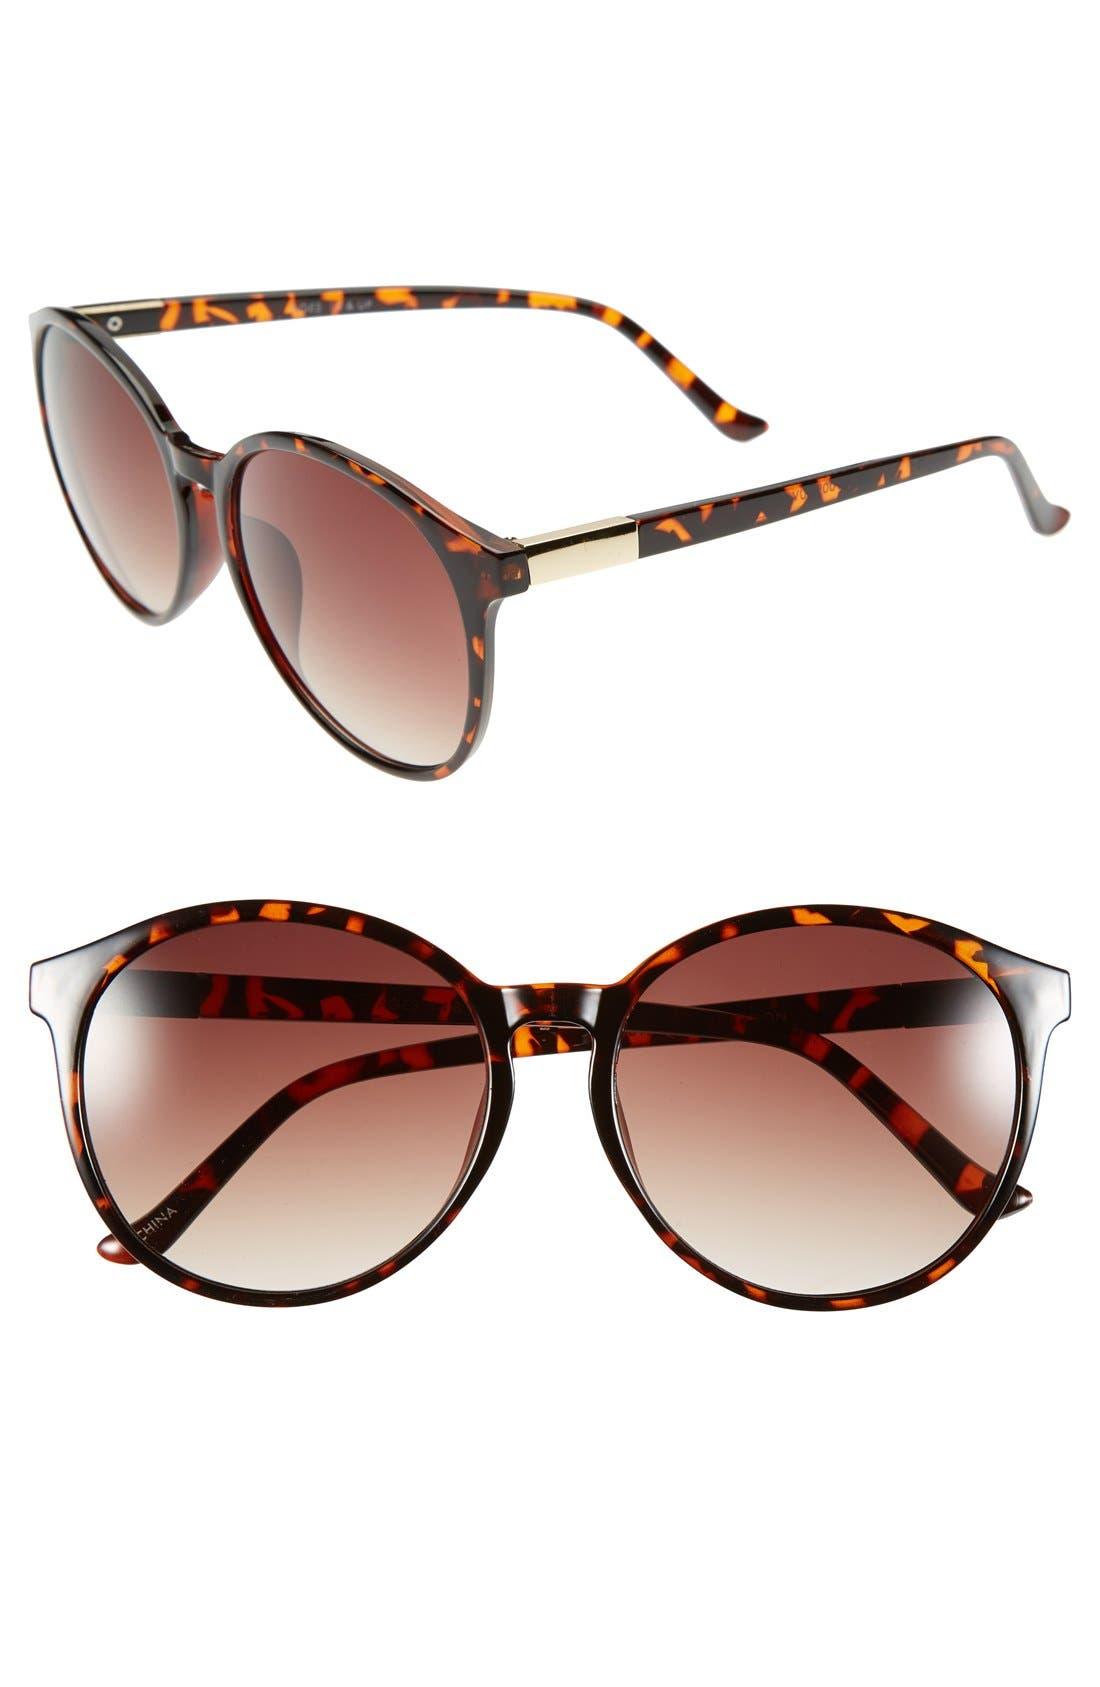 Main Image - Fantas Eyes 57mm Tortoise Shell Sunglasses (Juniors)